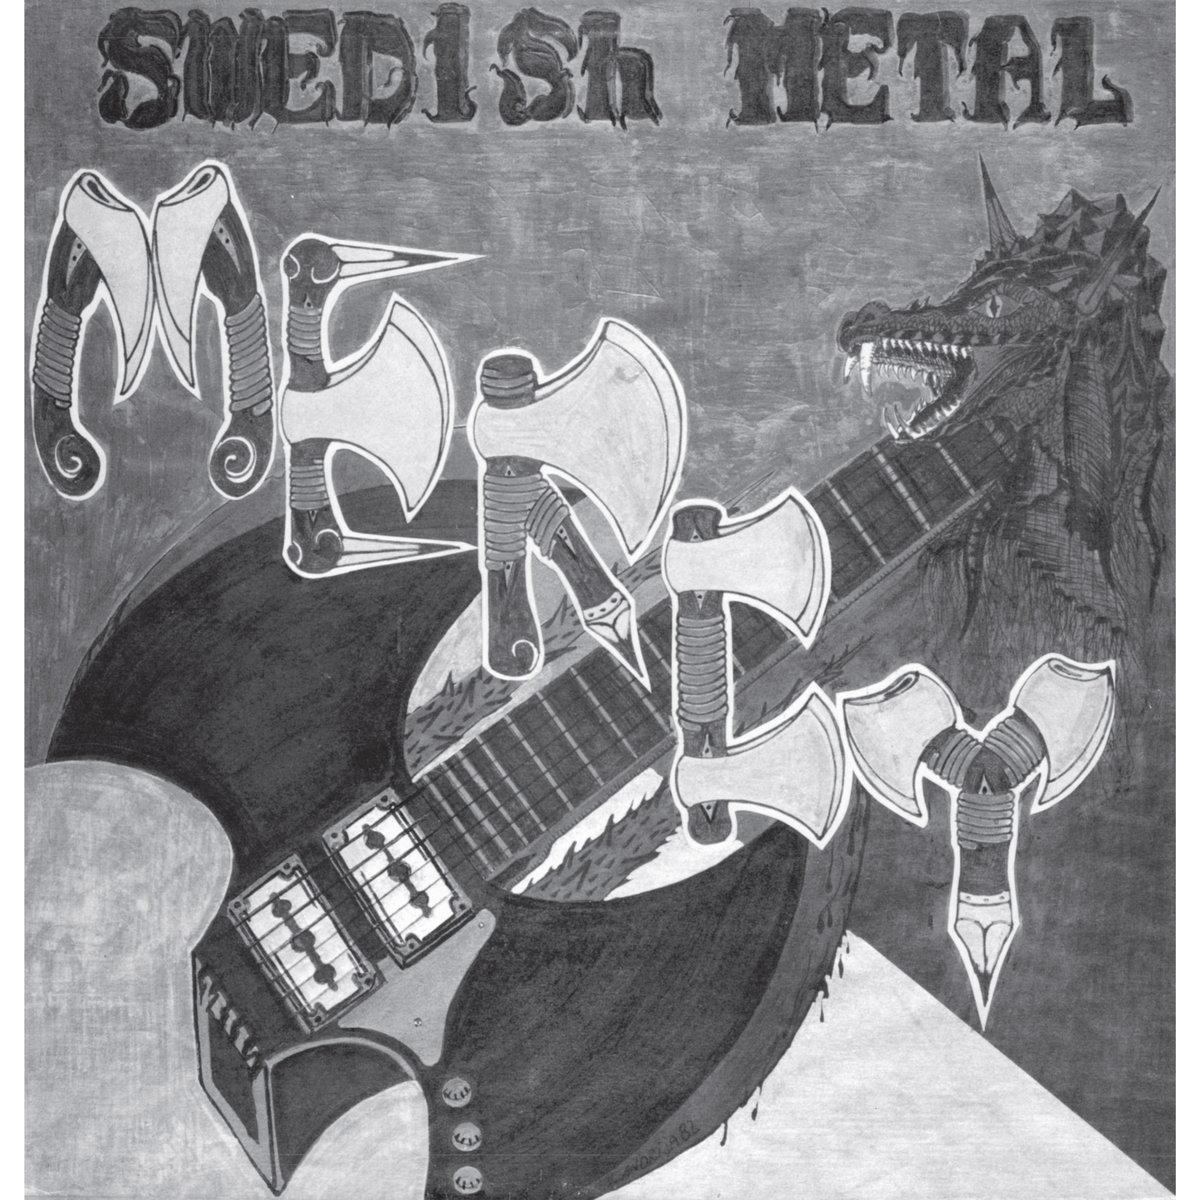 Mercy - Swedish Metal & Session 1981